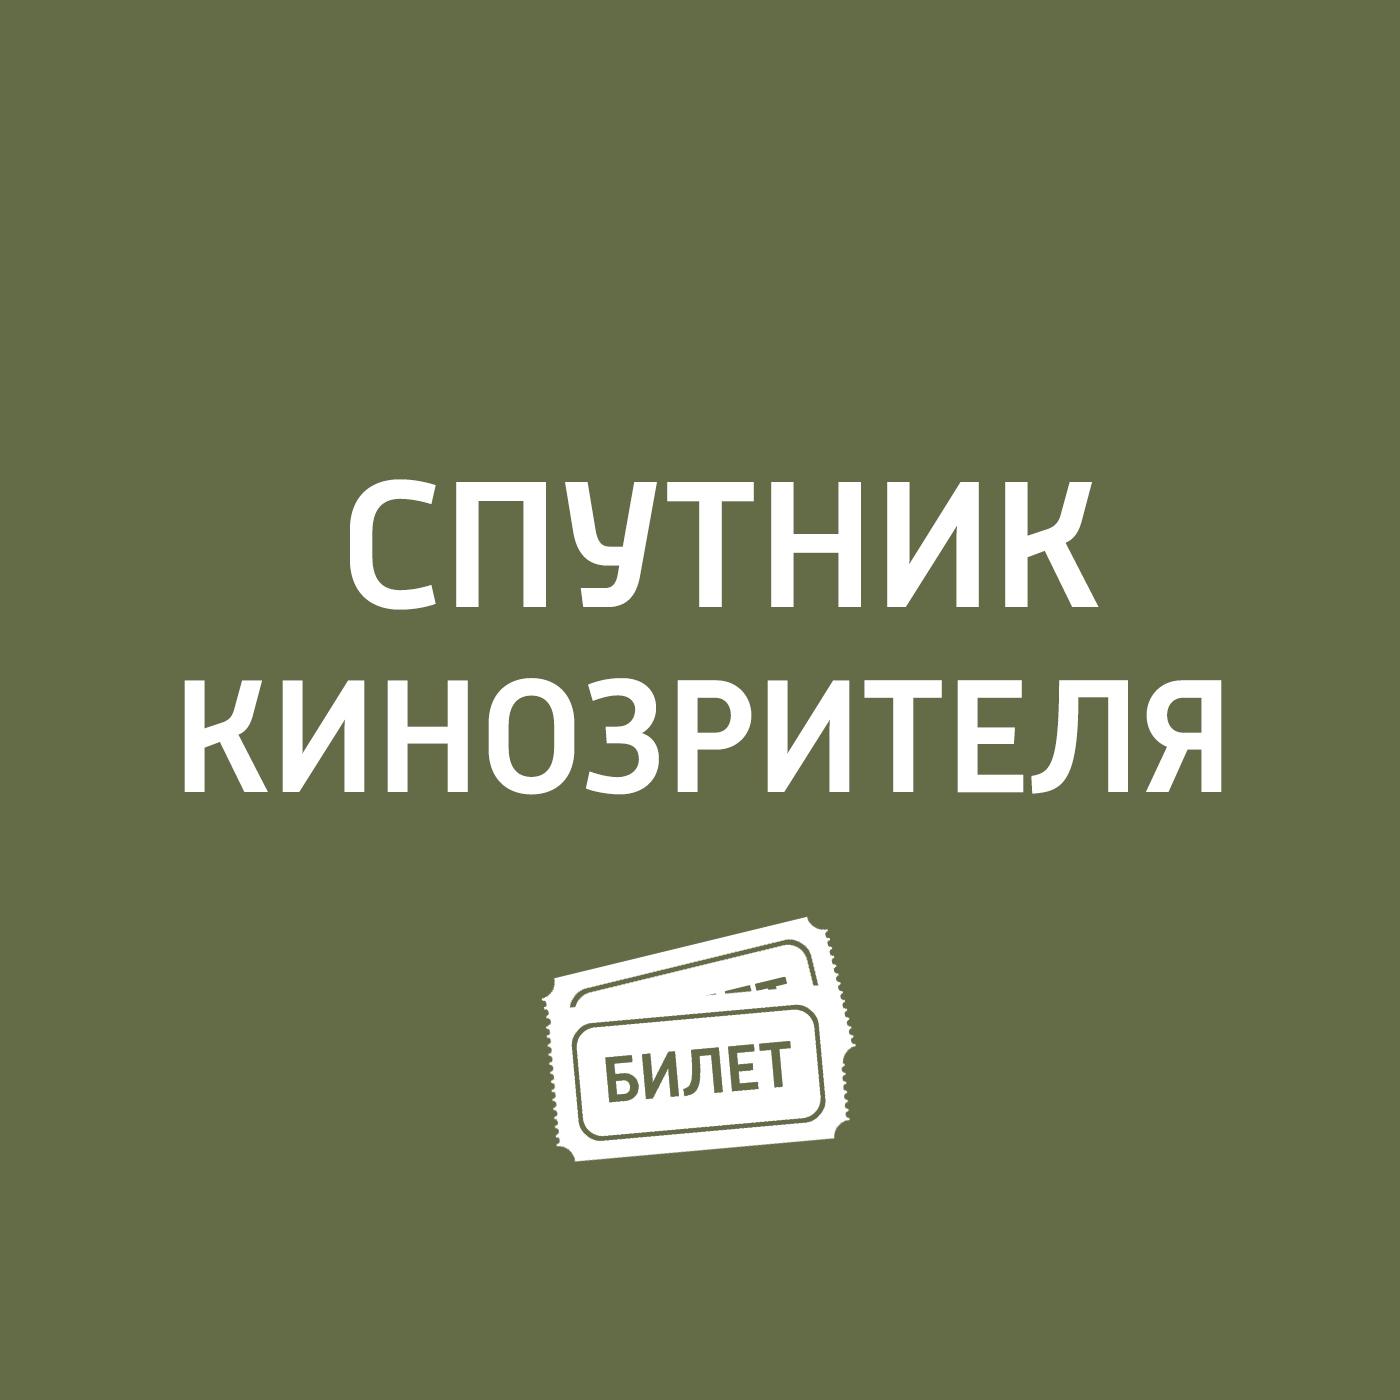 цена на Антон Долин Александр Зацепин отмечает 90-летний юбилей